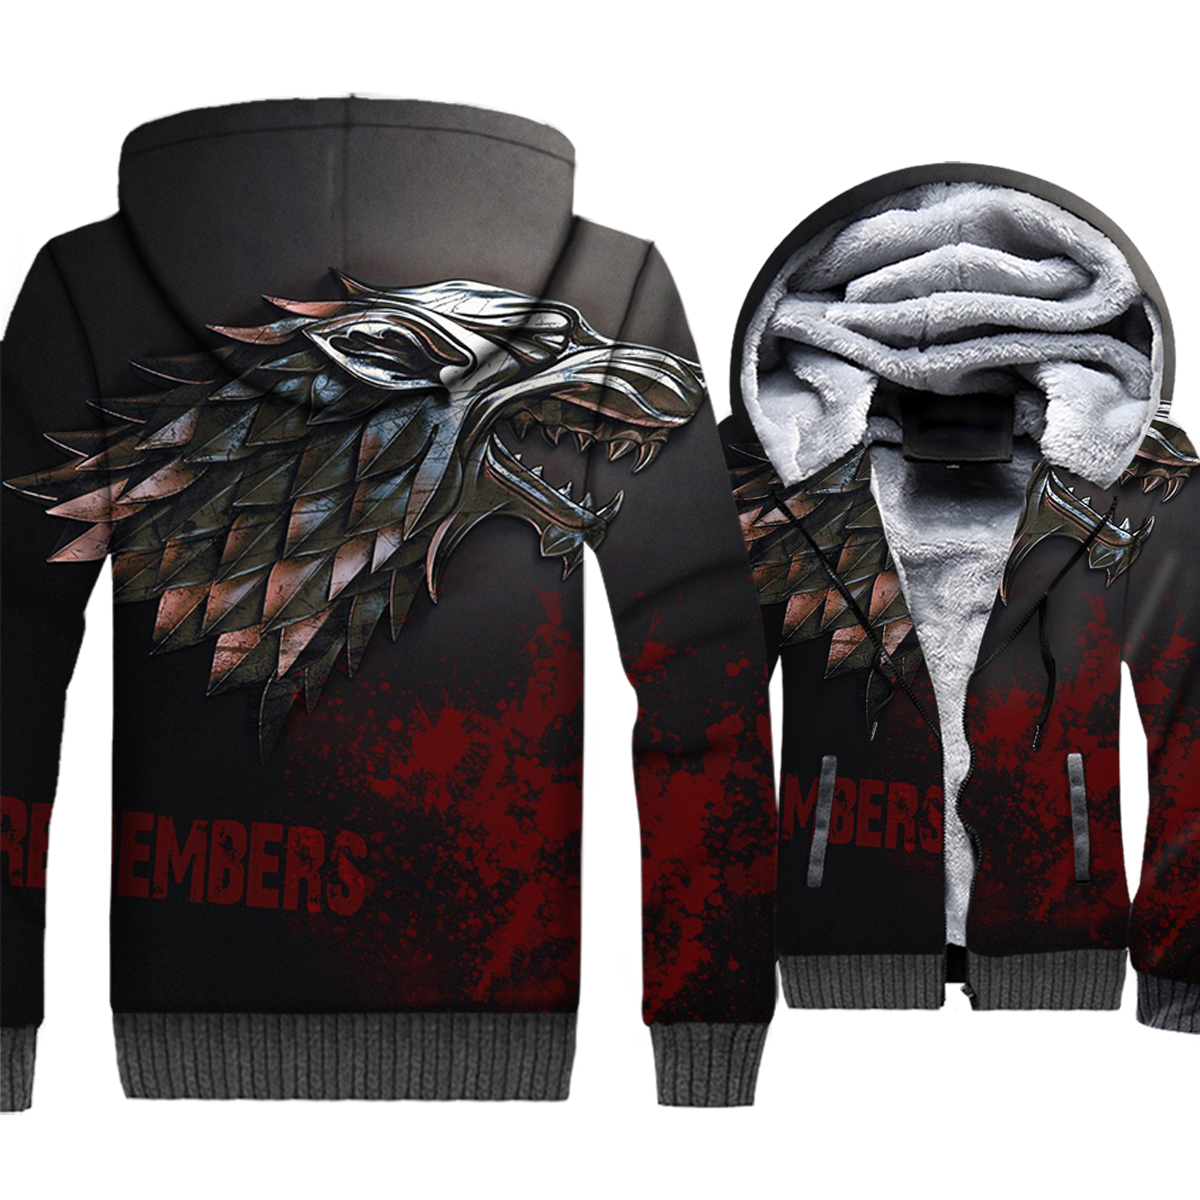 Game of Thrones 3D Jacket Men Hip Hop Hoodies The North Remembers House Stark Wolf Sweatshirt Winter House Targaryen Dragon Coat